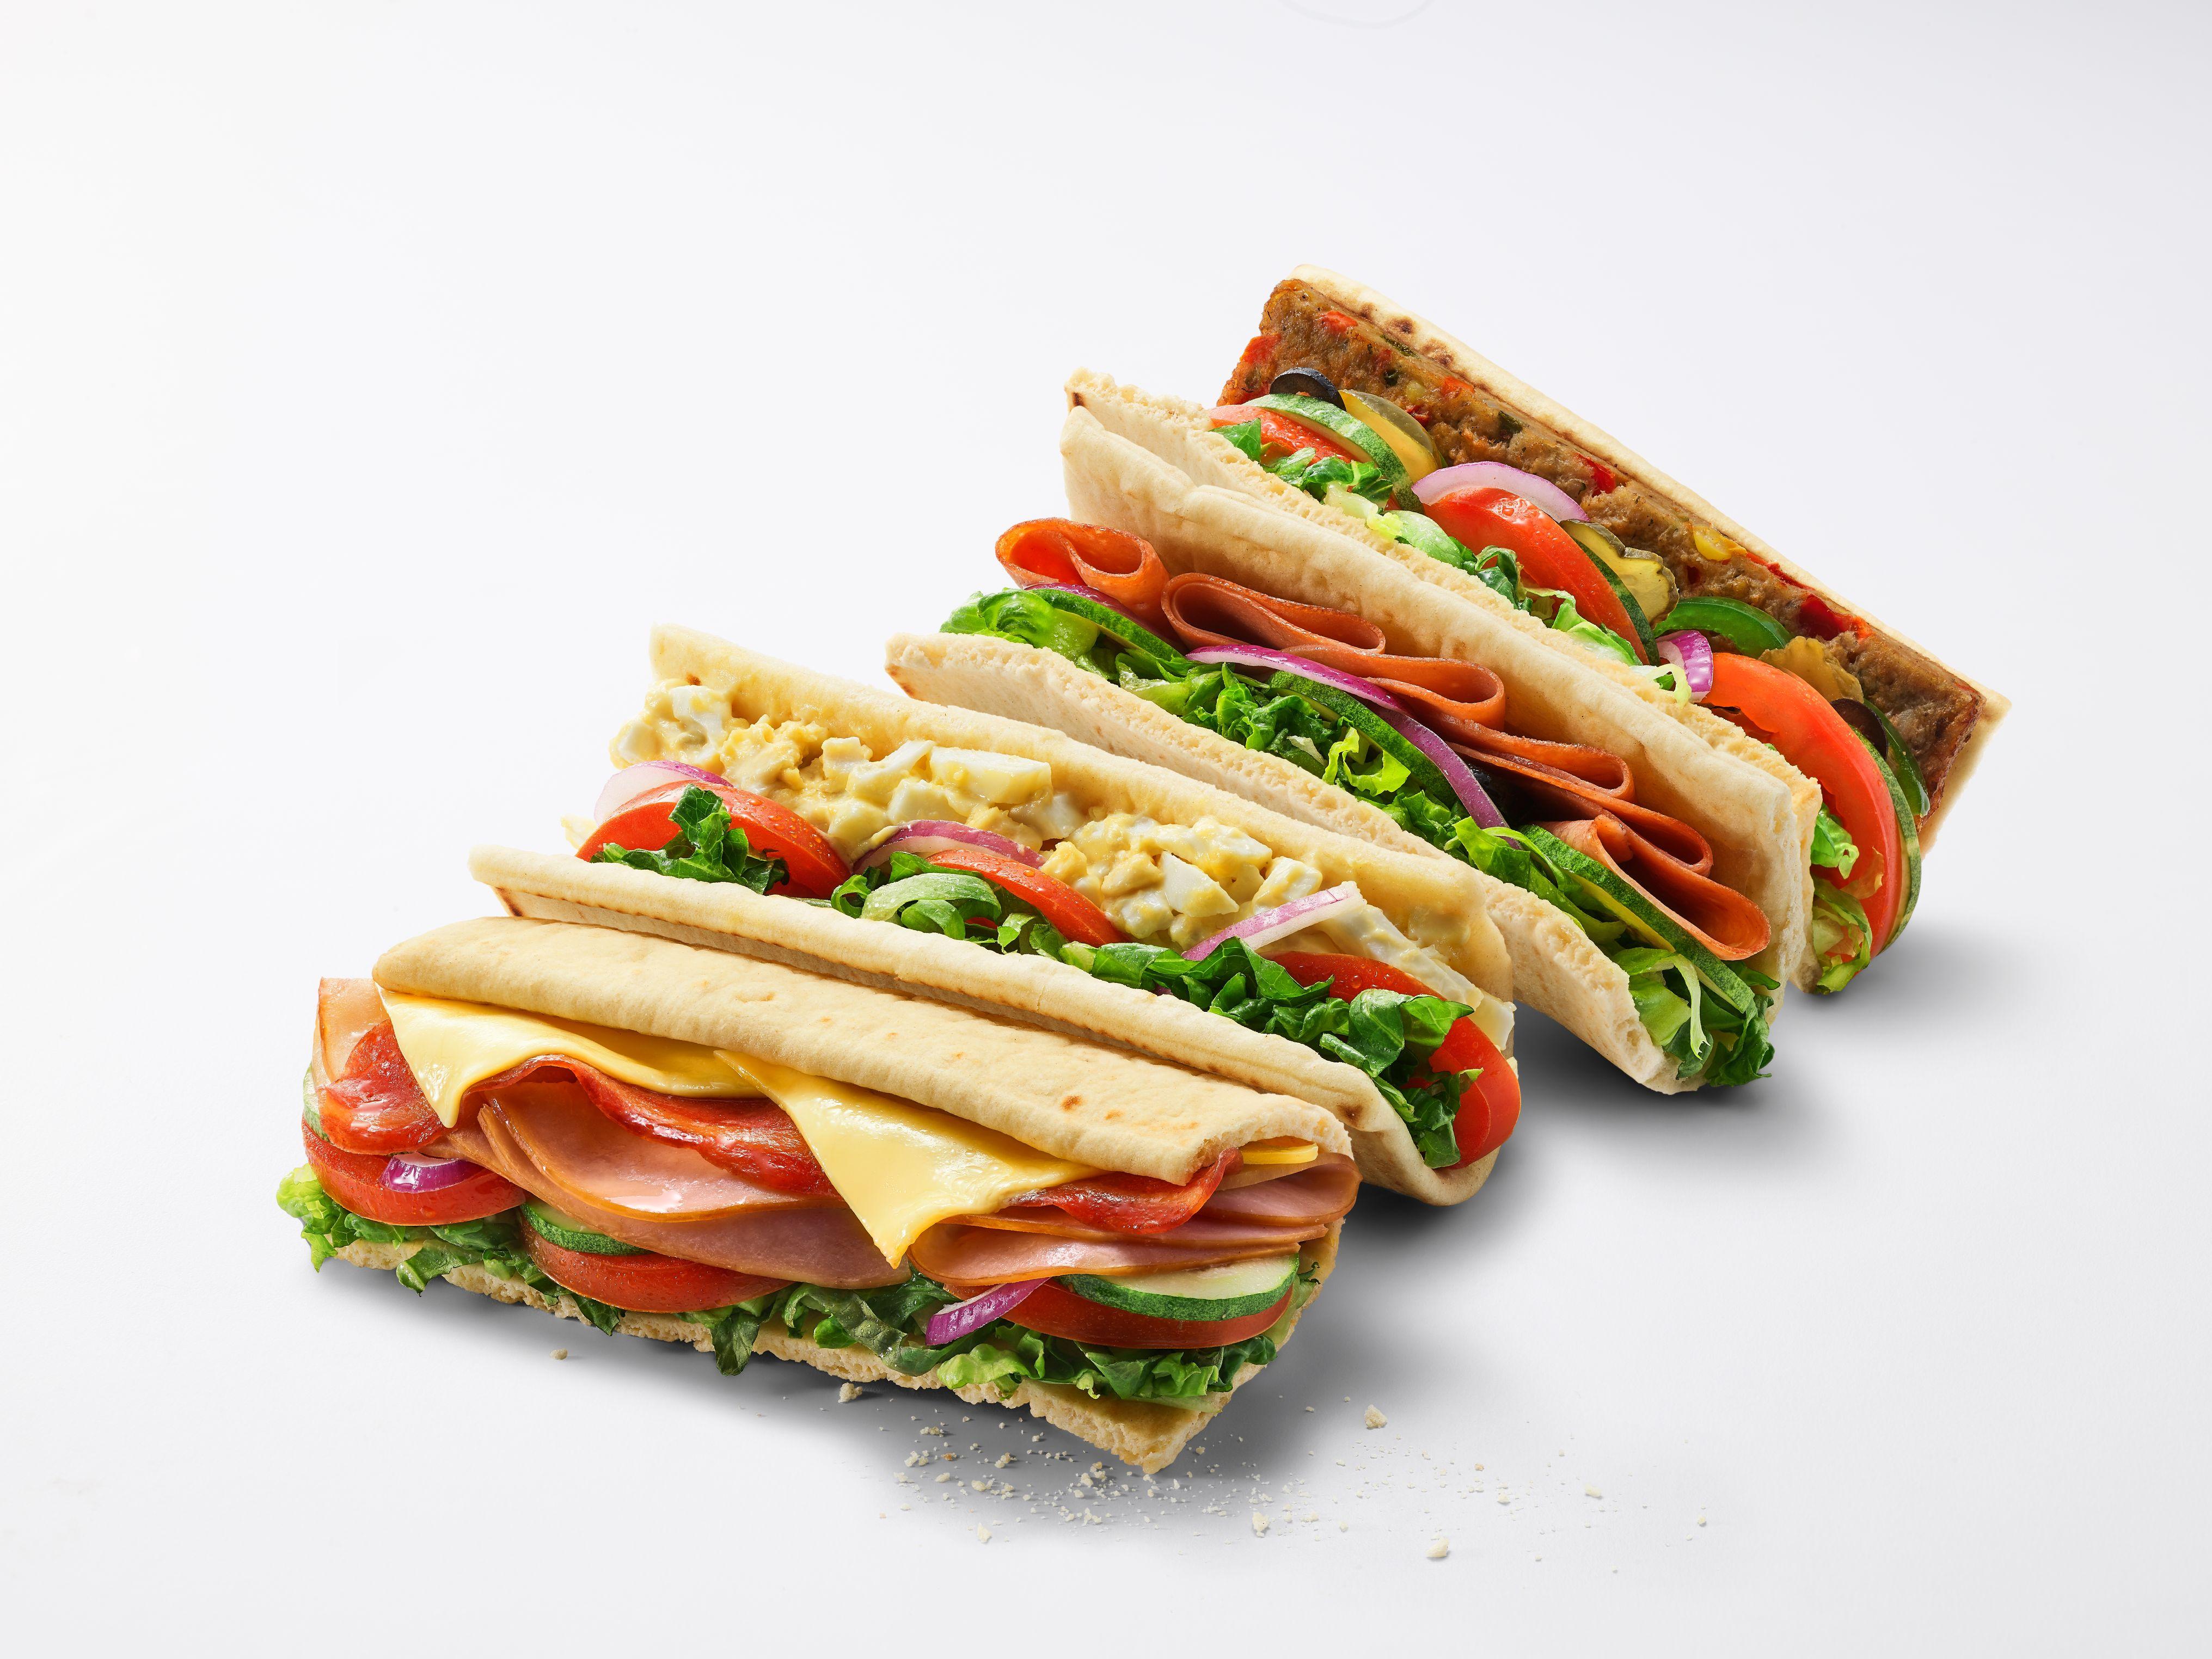 Subway (Expo) - Dine, Shop, Earn